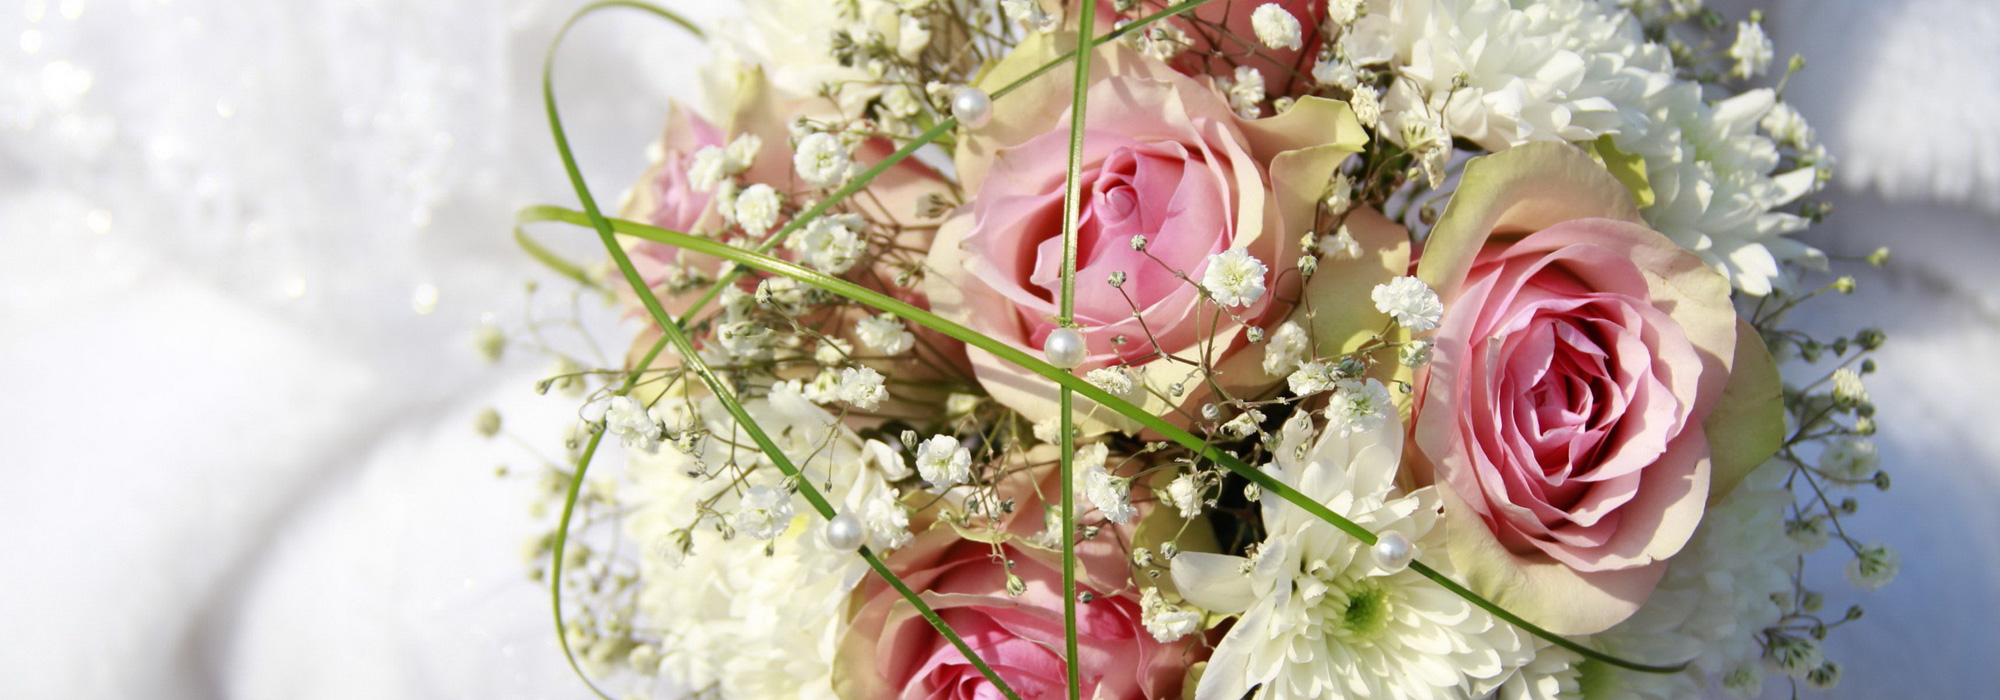 Denver Wedding Florist Advice